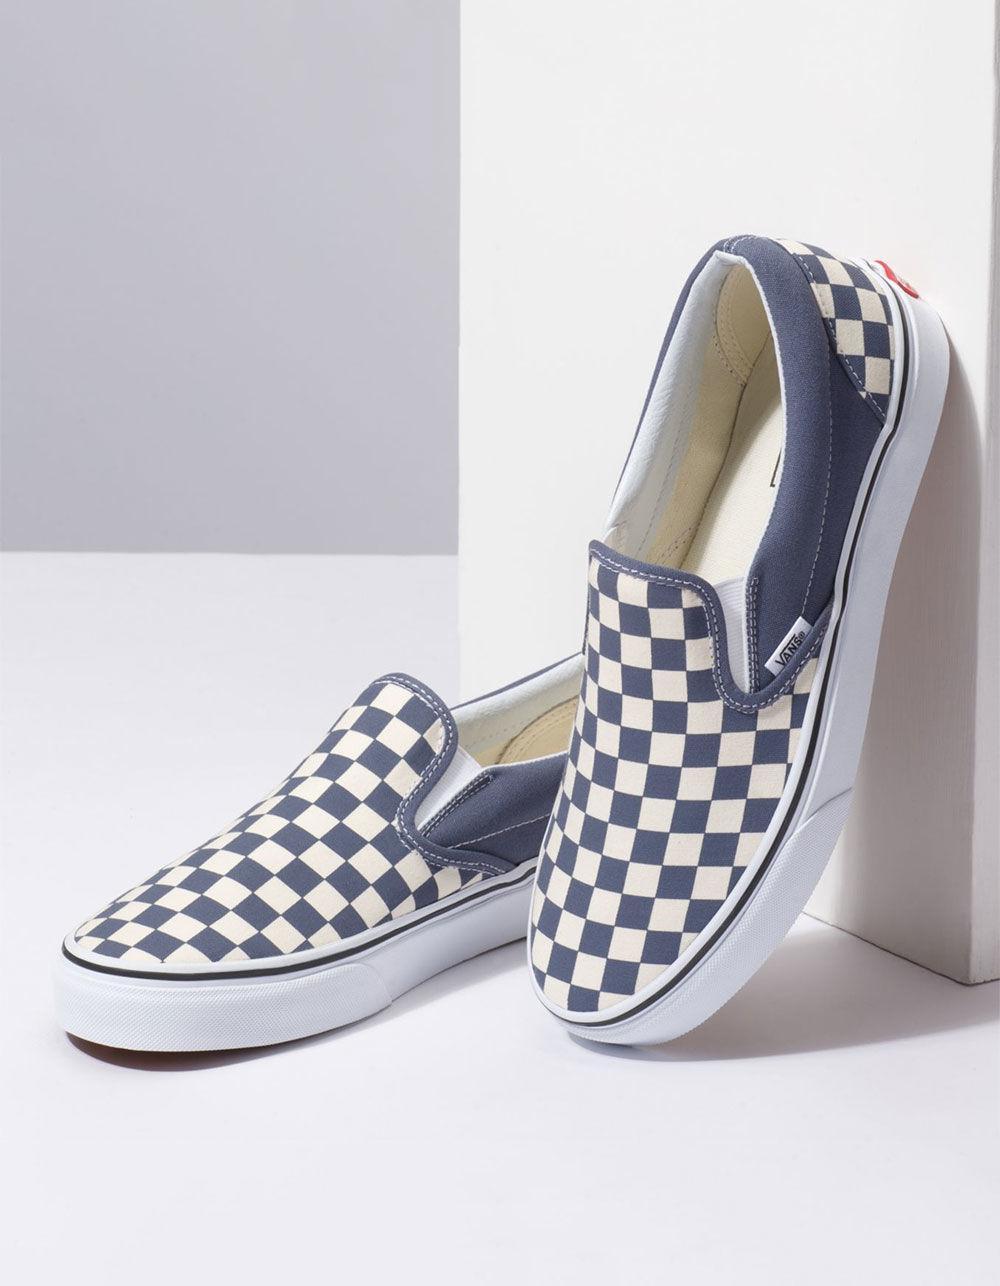 Vans Canvas Checkerboard Grisaille